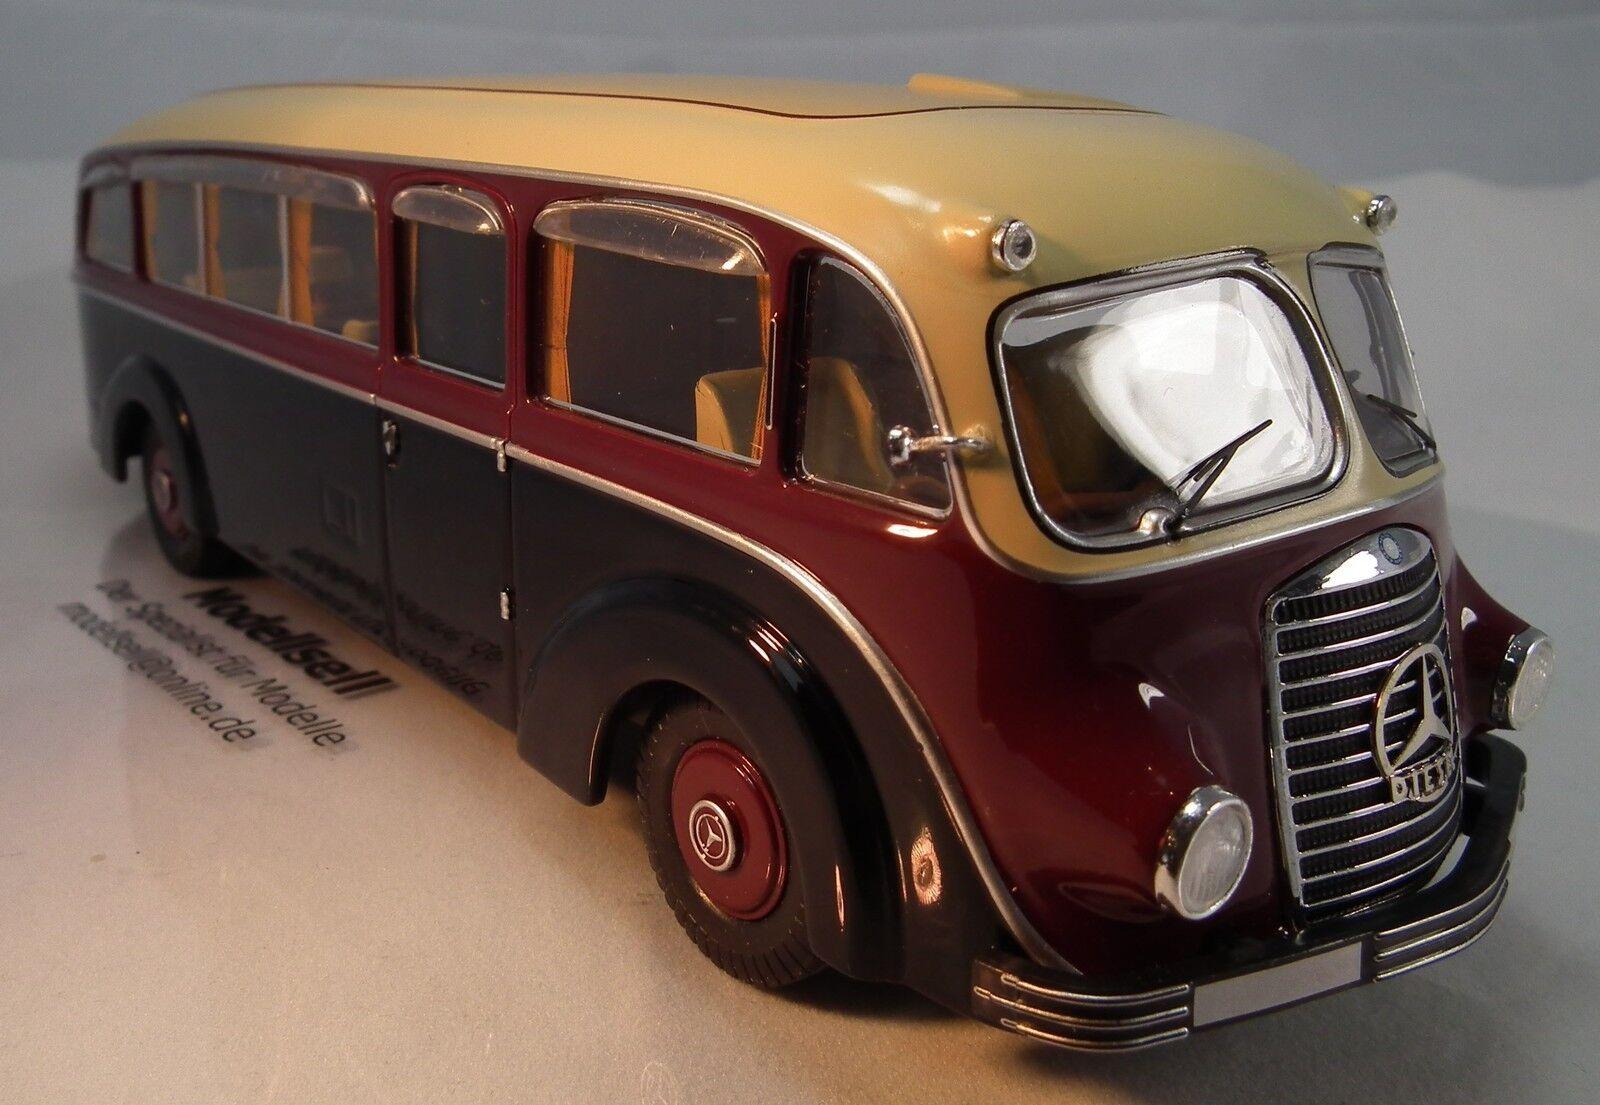 Mercedes benz lo3500 bus travel wagon Conference salon 1 43 premium classixxs